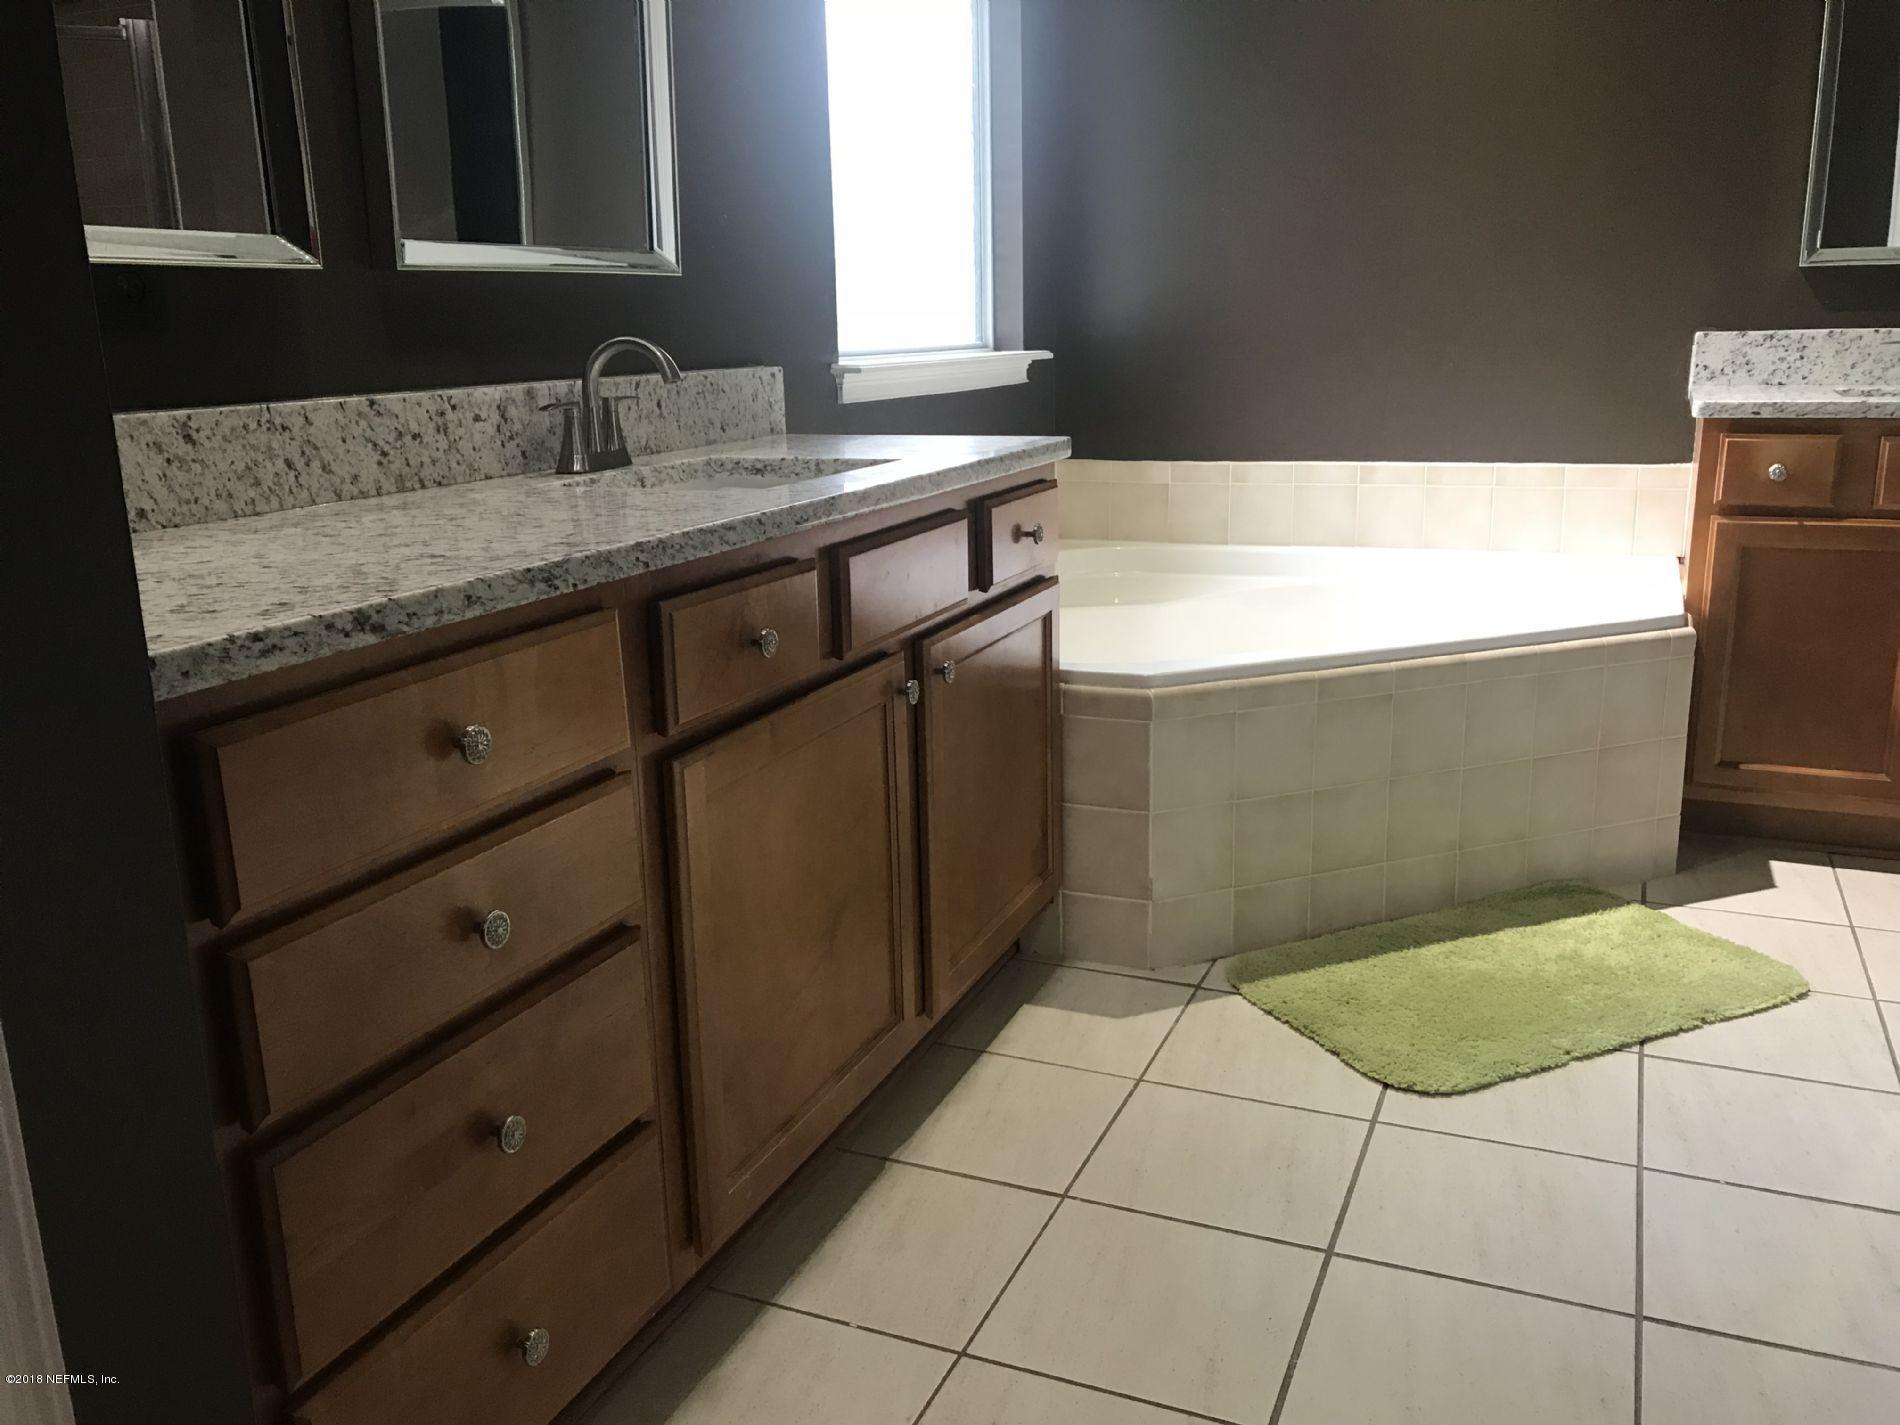 6669 Beatrix, JACKSONVILLE, FLORIDA 32226, 3 Bedrooms Bedrooms, ,2 BathroomsBathrooms,Residential - single family,For sale,Beatrix,952921